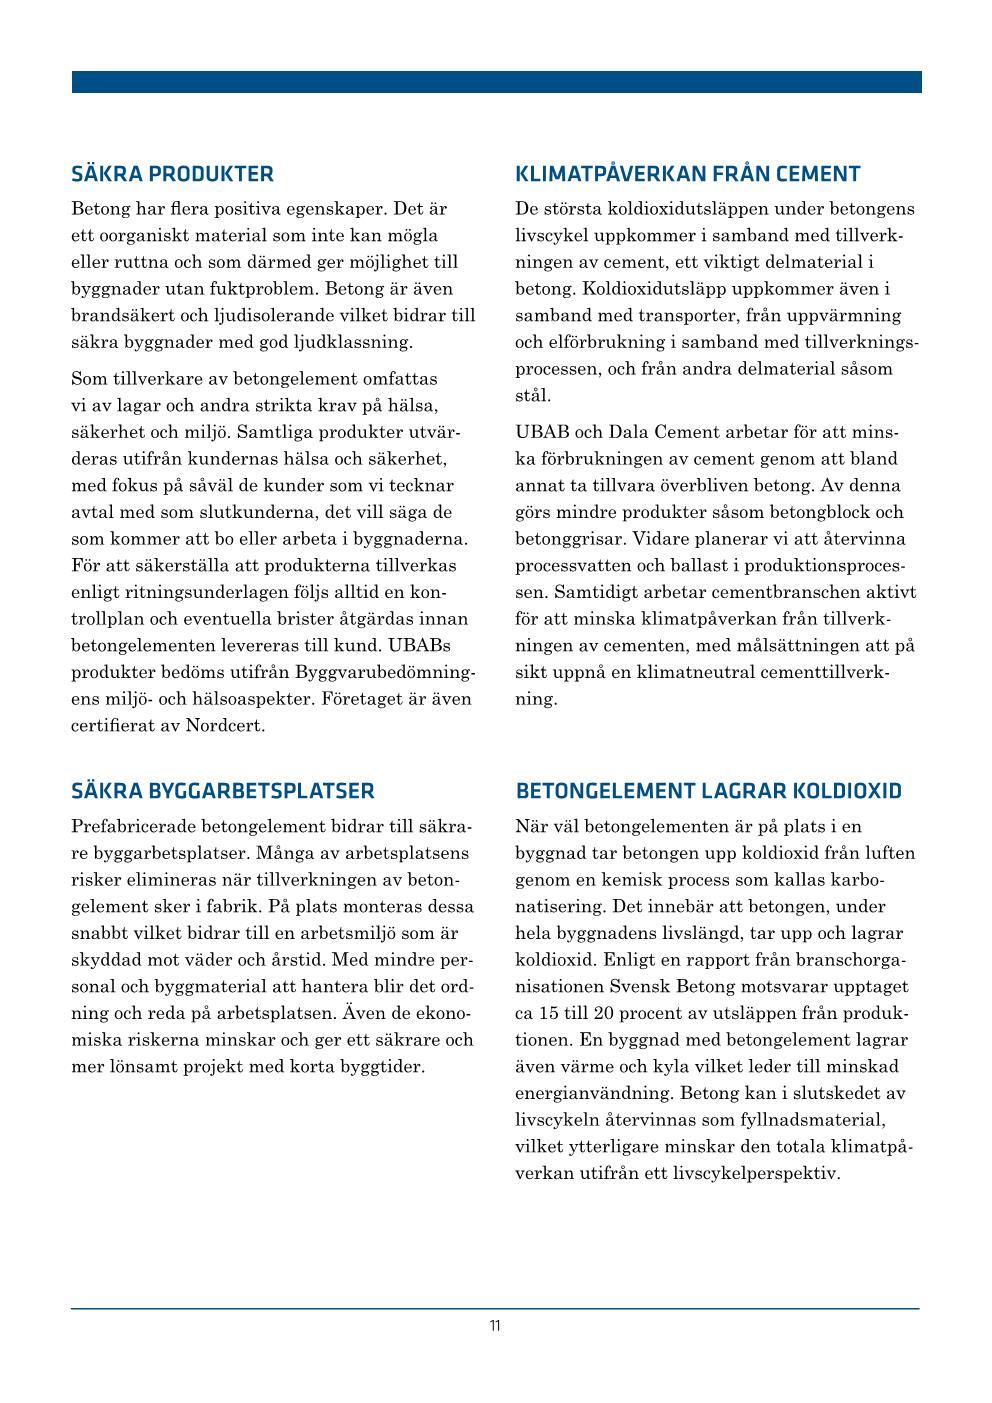 UBAB Hållbarhetsredovisning 2018_webres Sida 011